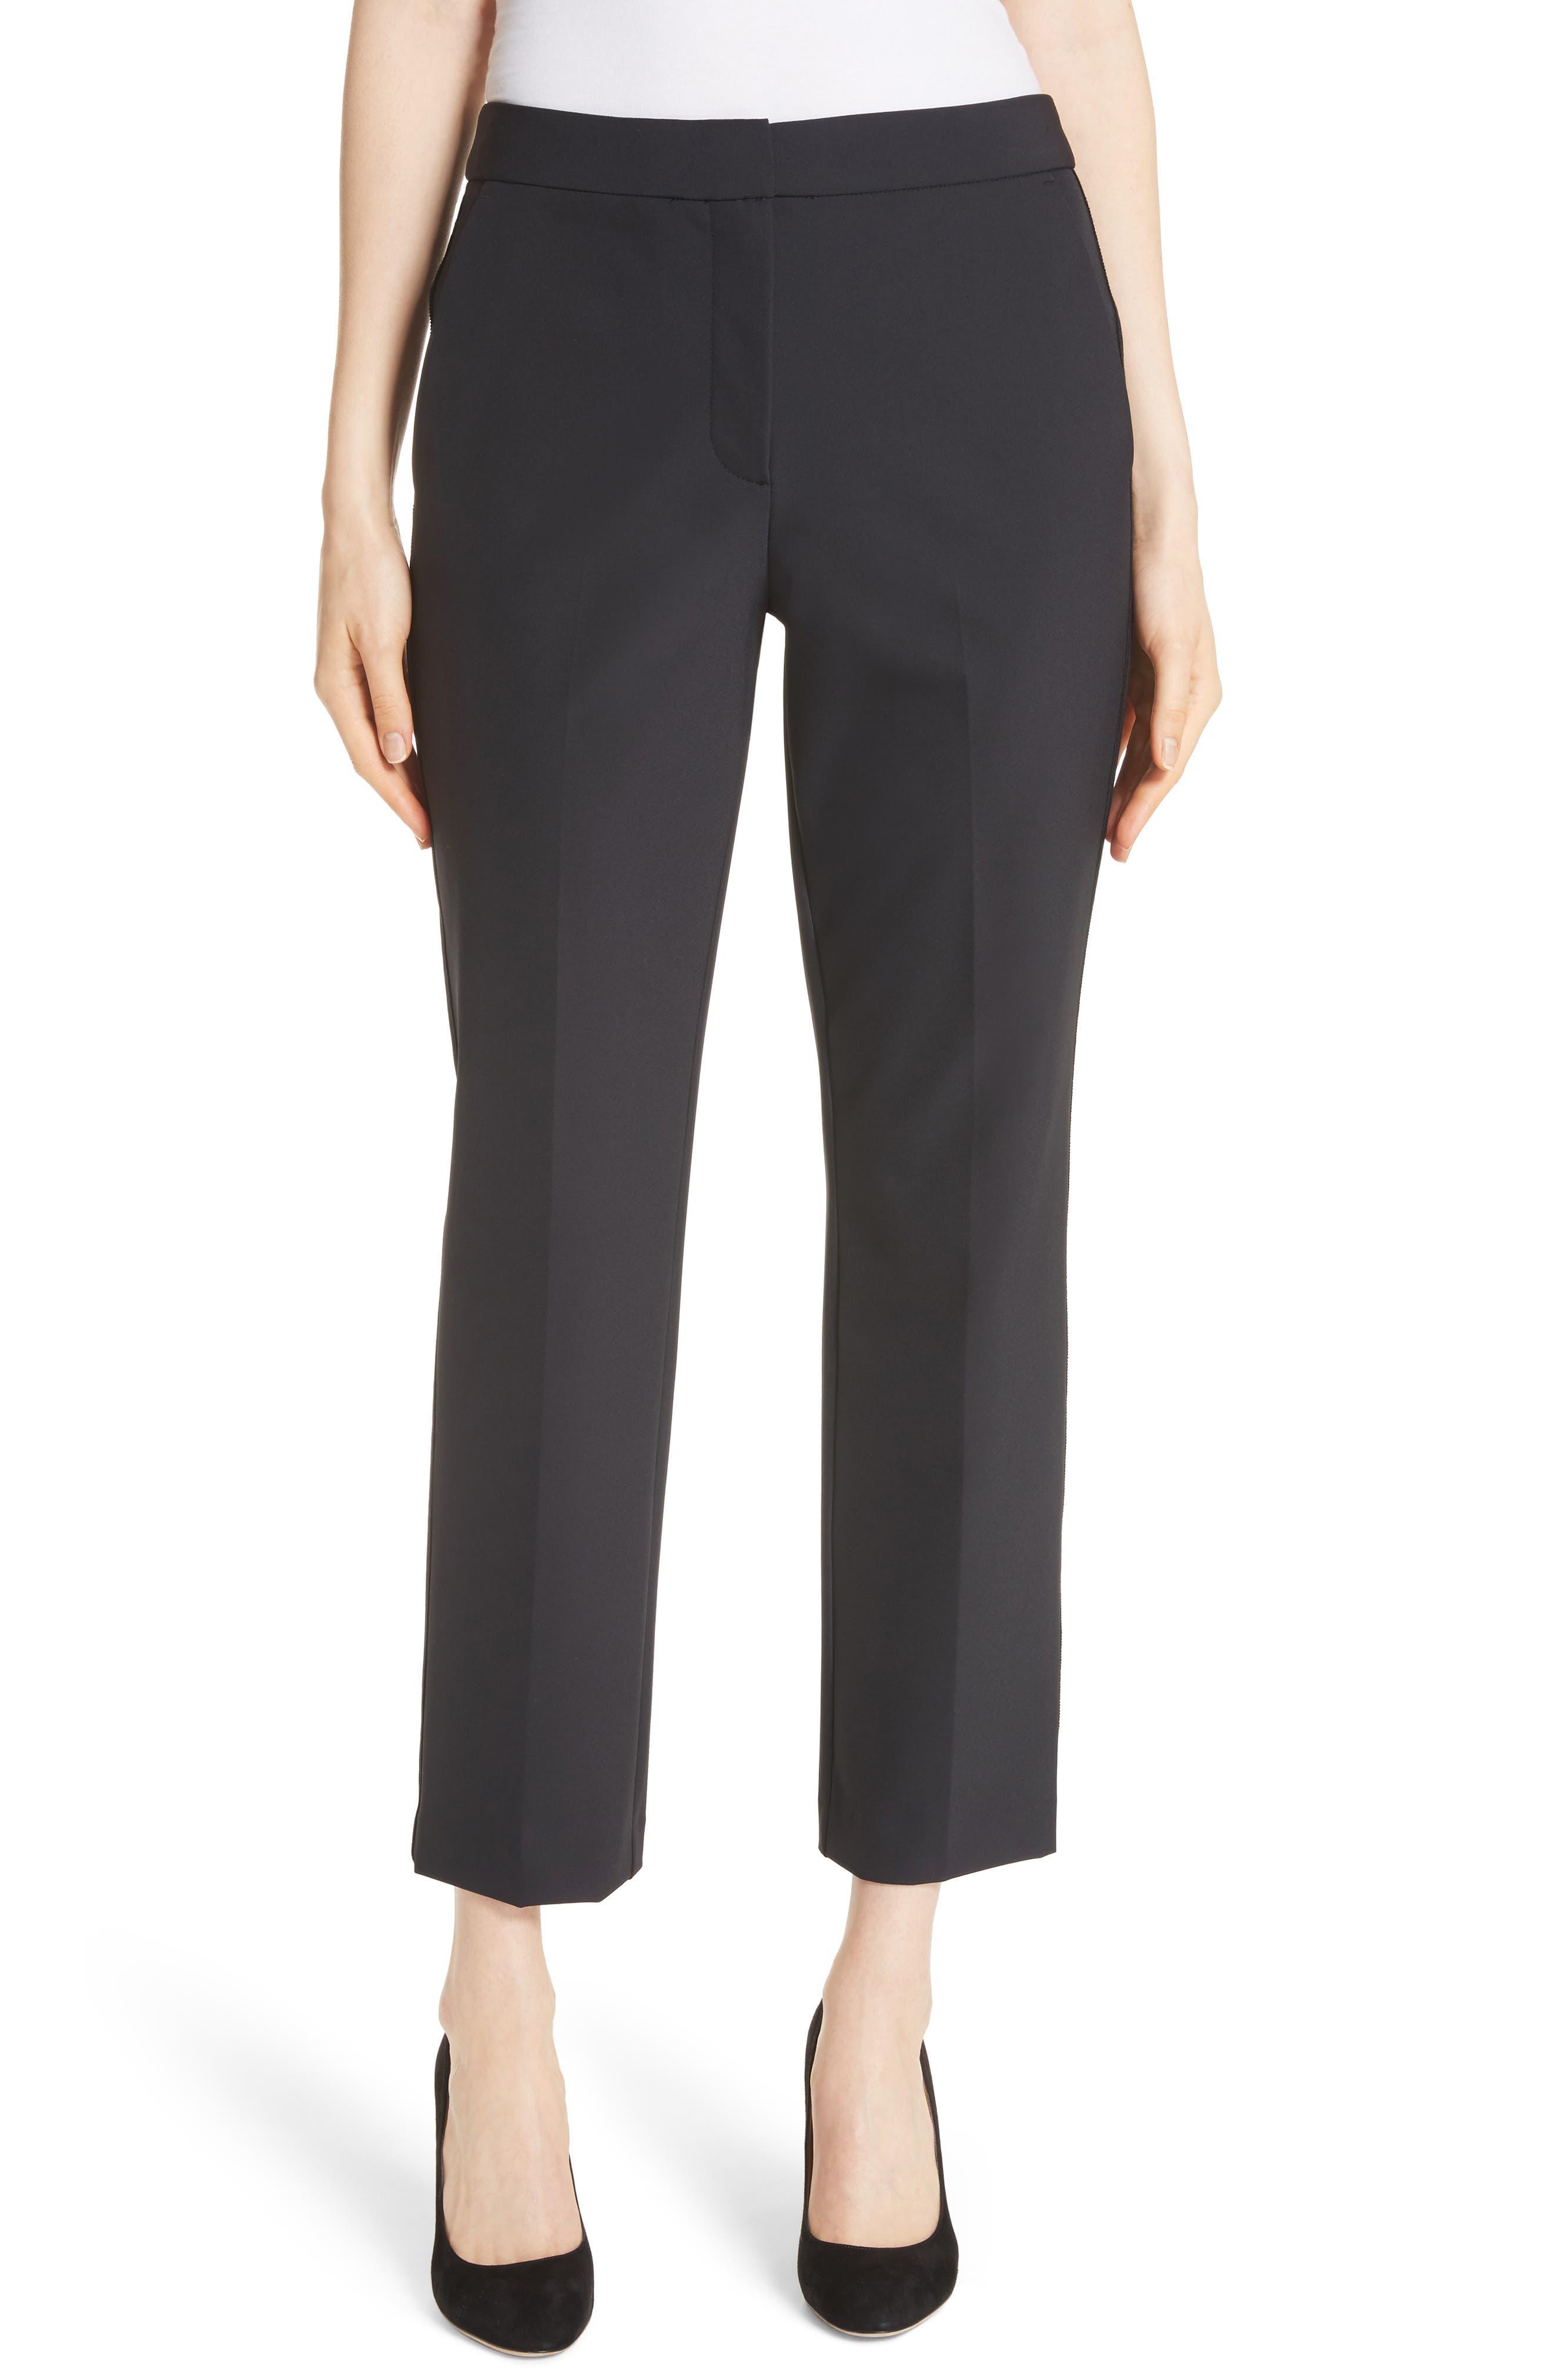 REBECCA TAYLOR, Audra Crop Pants, Main thumbnail 1, color, BLACK